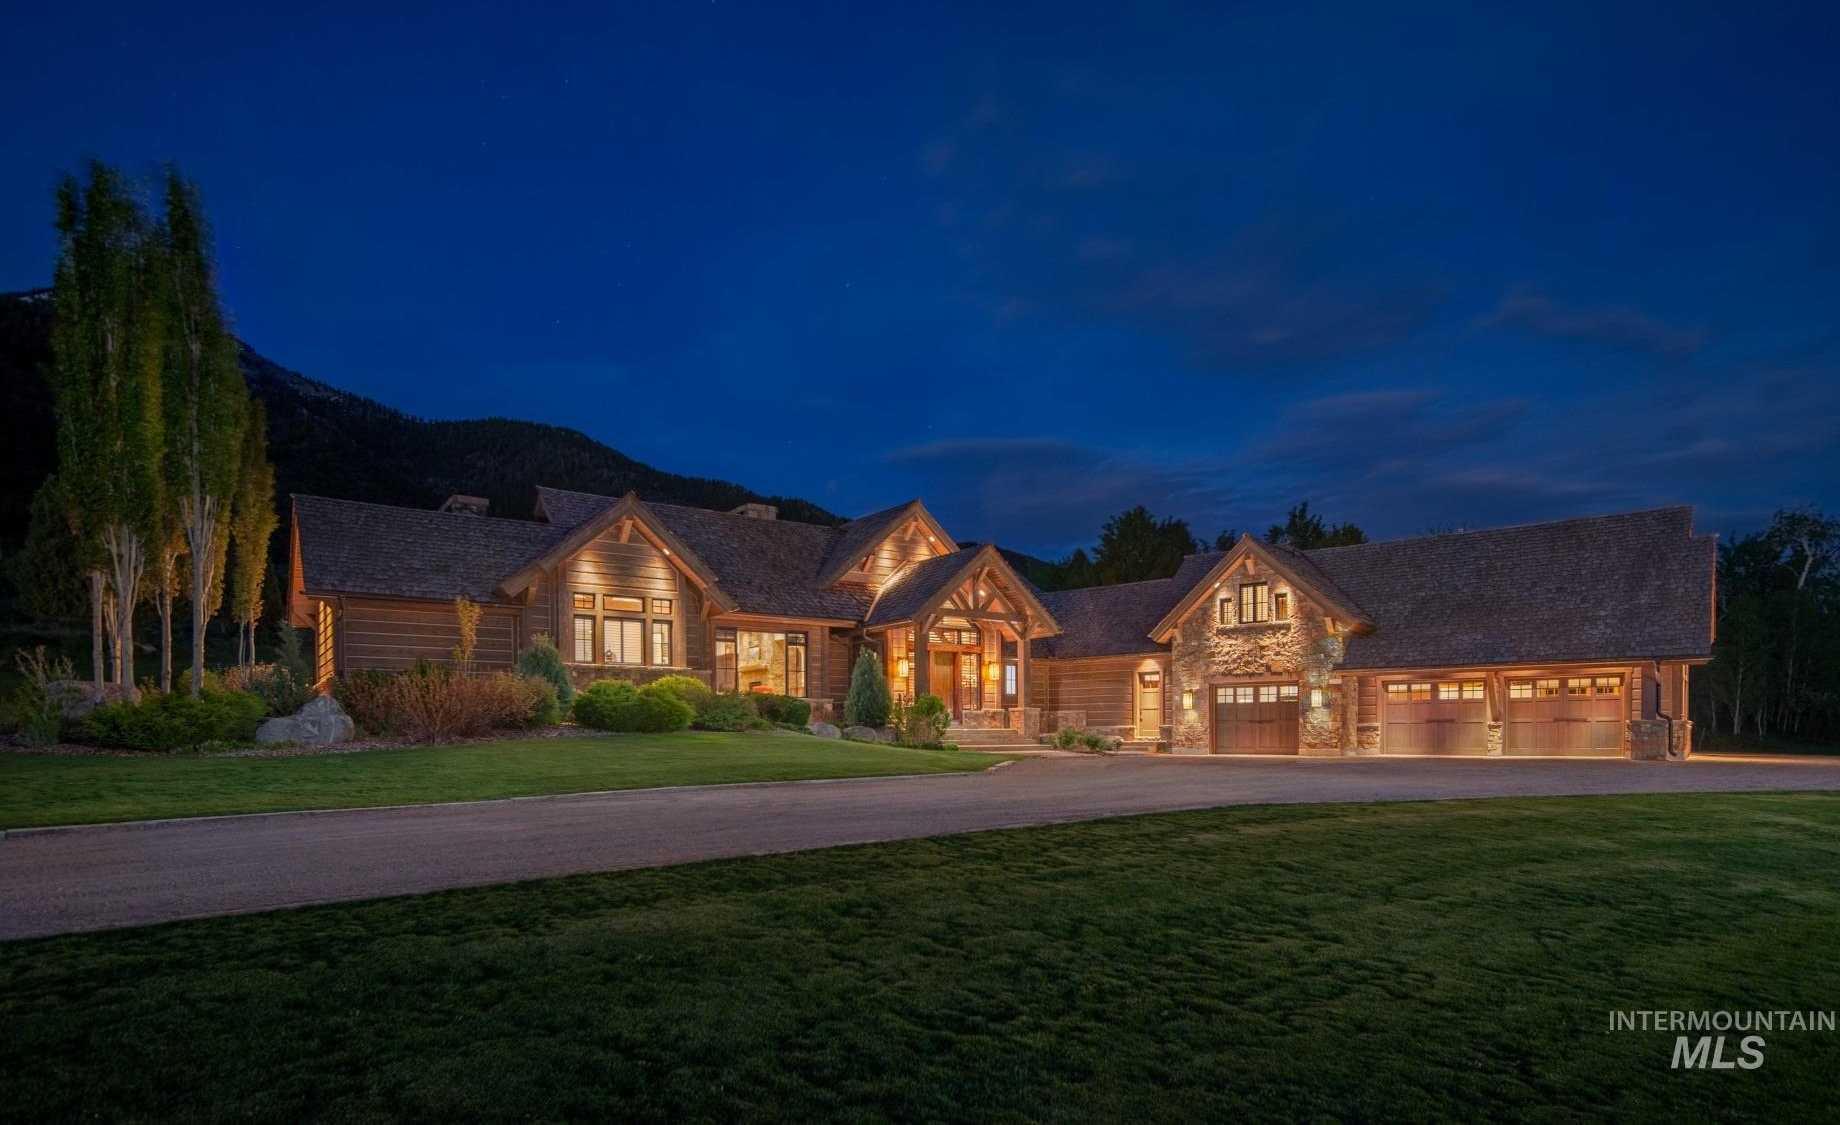 $6,250,000 - 3Br/4Ba -  for Sale in Elk Ridge Sub, Irwin